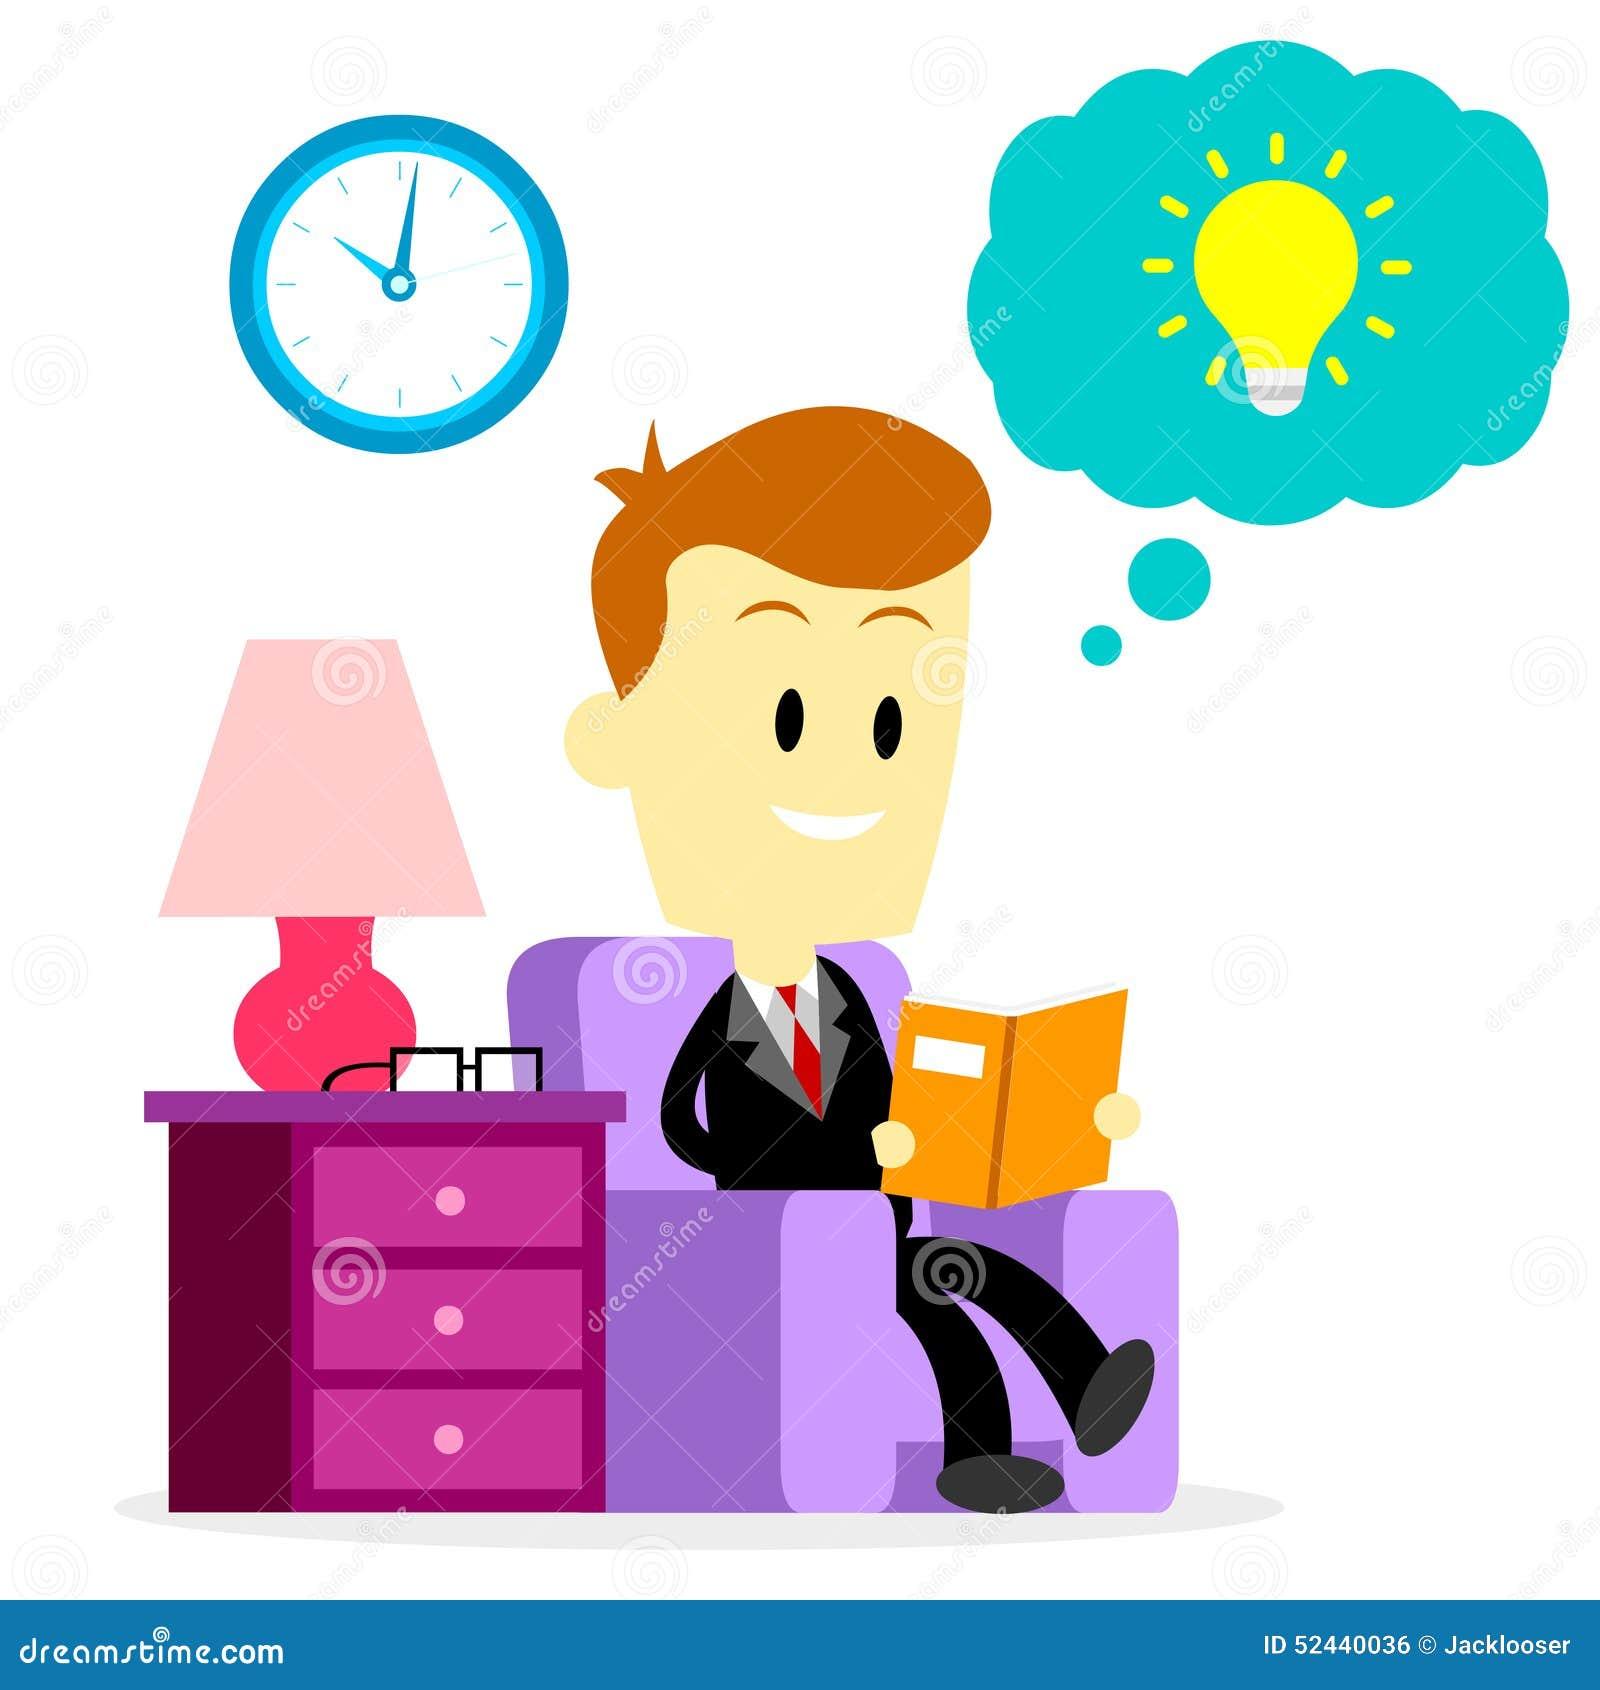 how to improve reading skills pdf